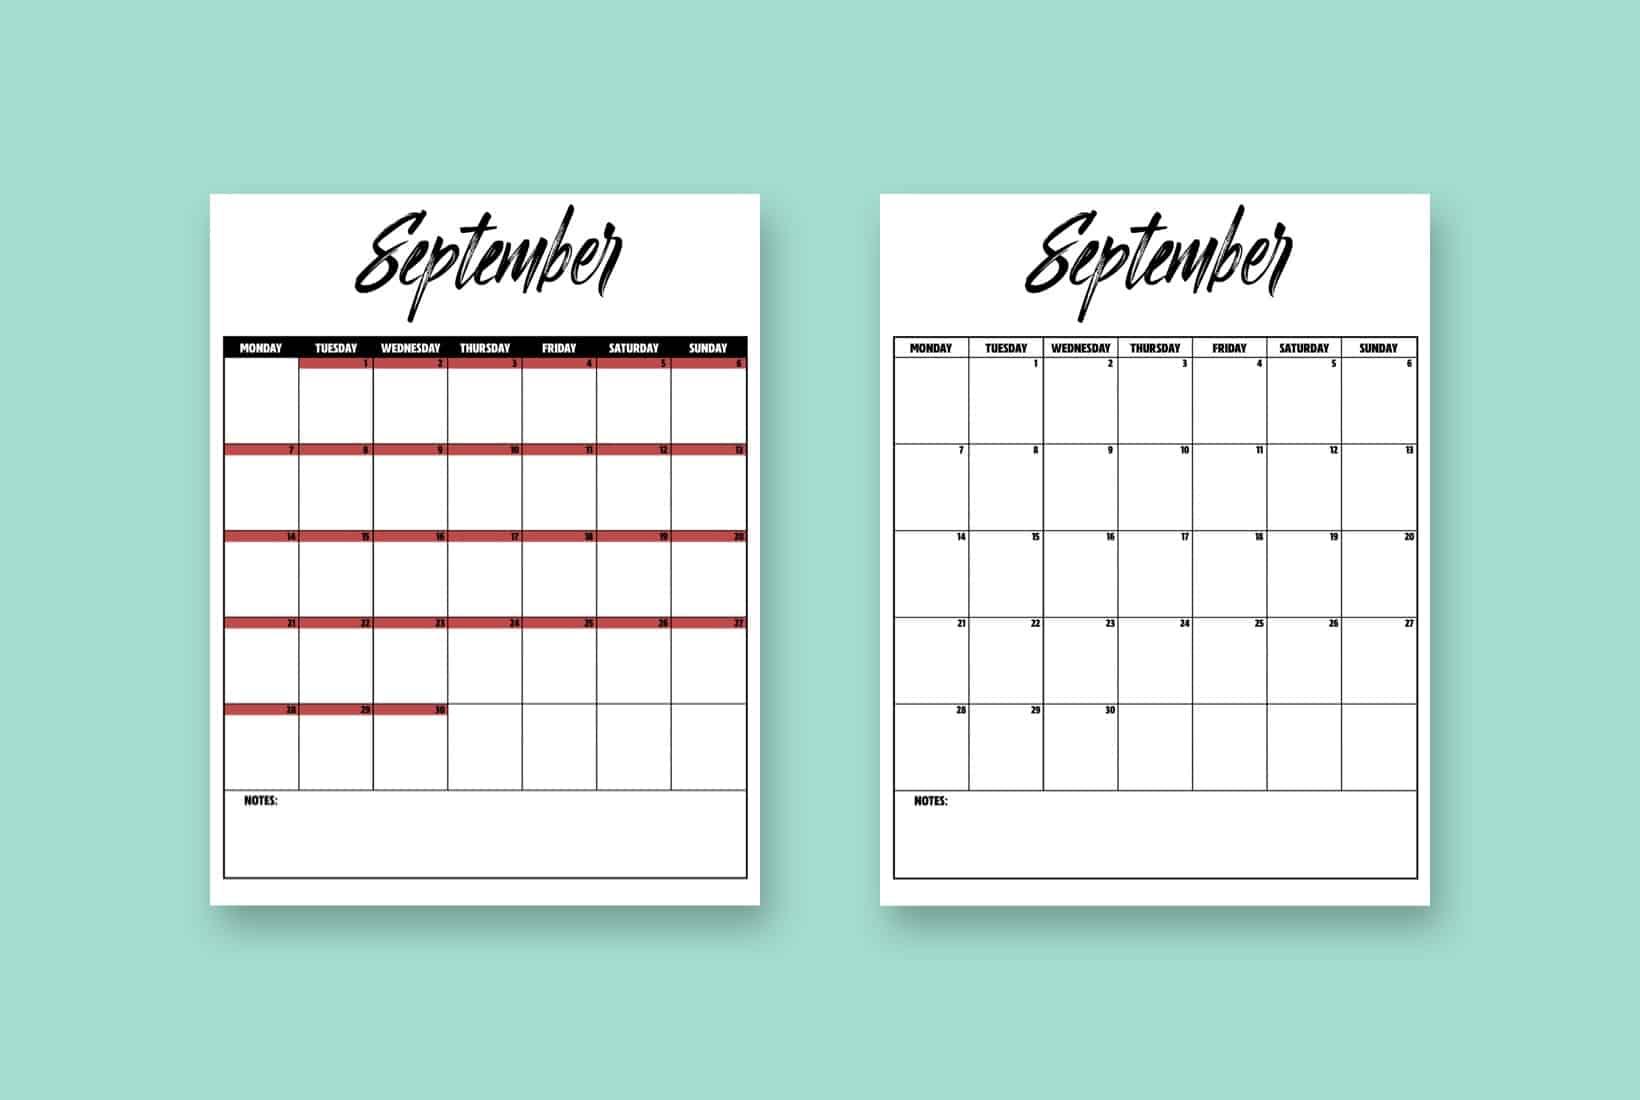 template for september 2020 printable